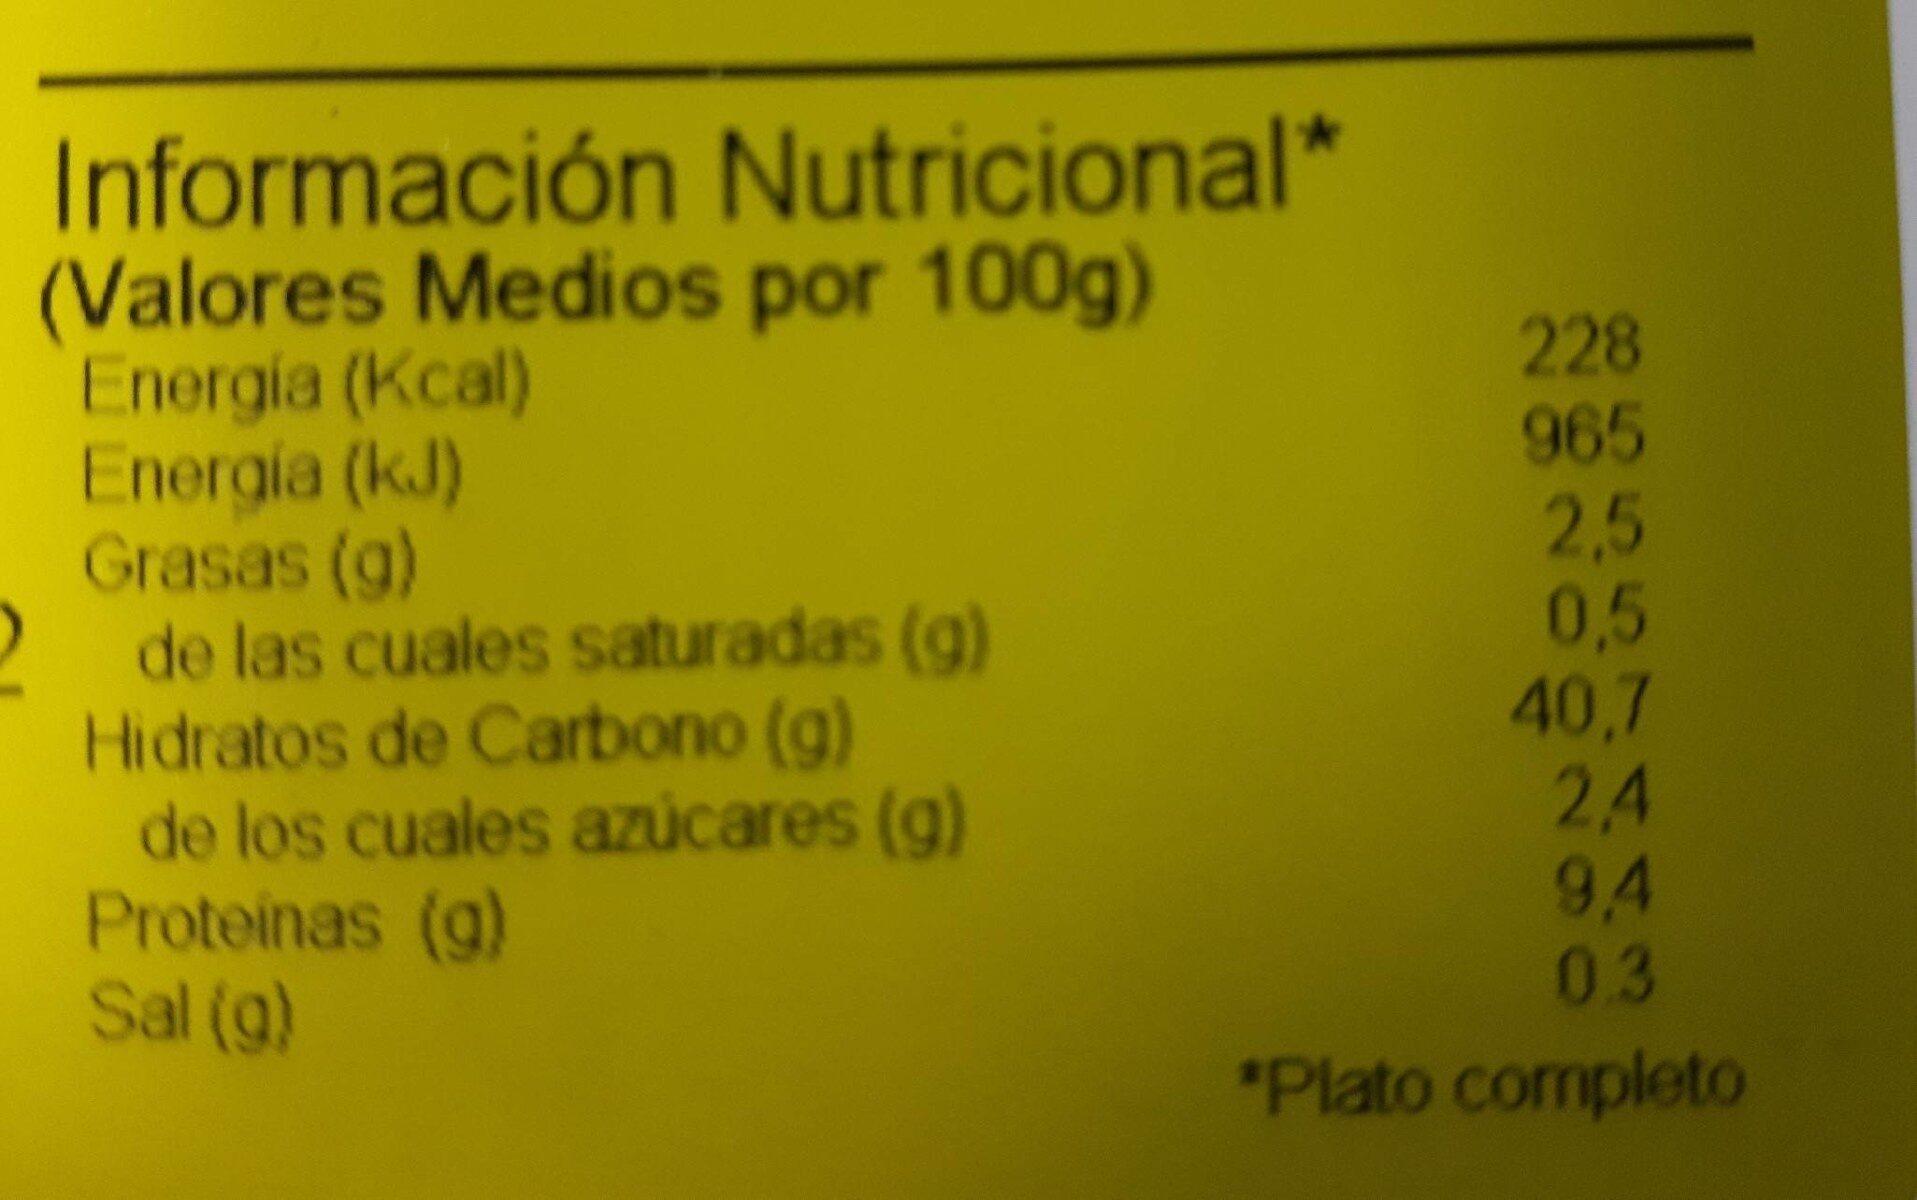 TAPPERS - Radiatori Boloñesa - Nutrition facts